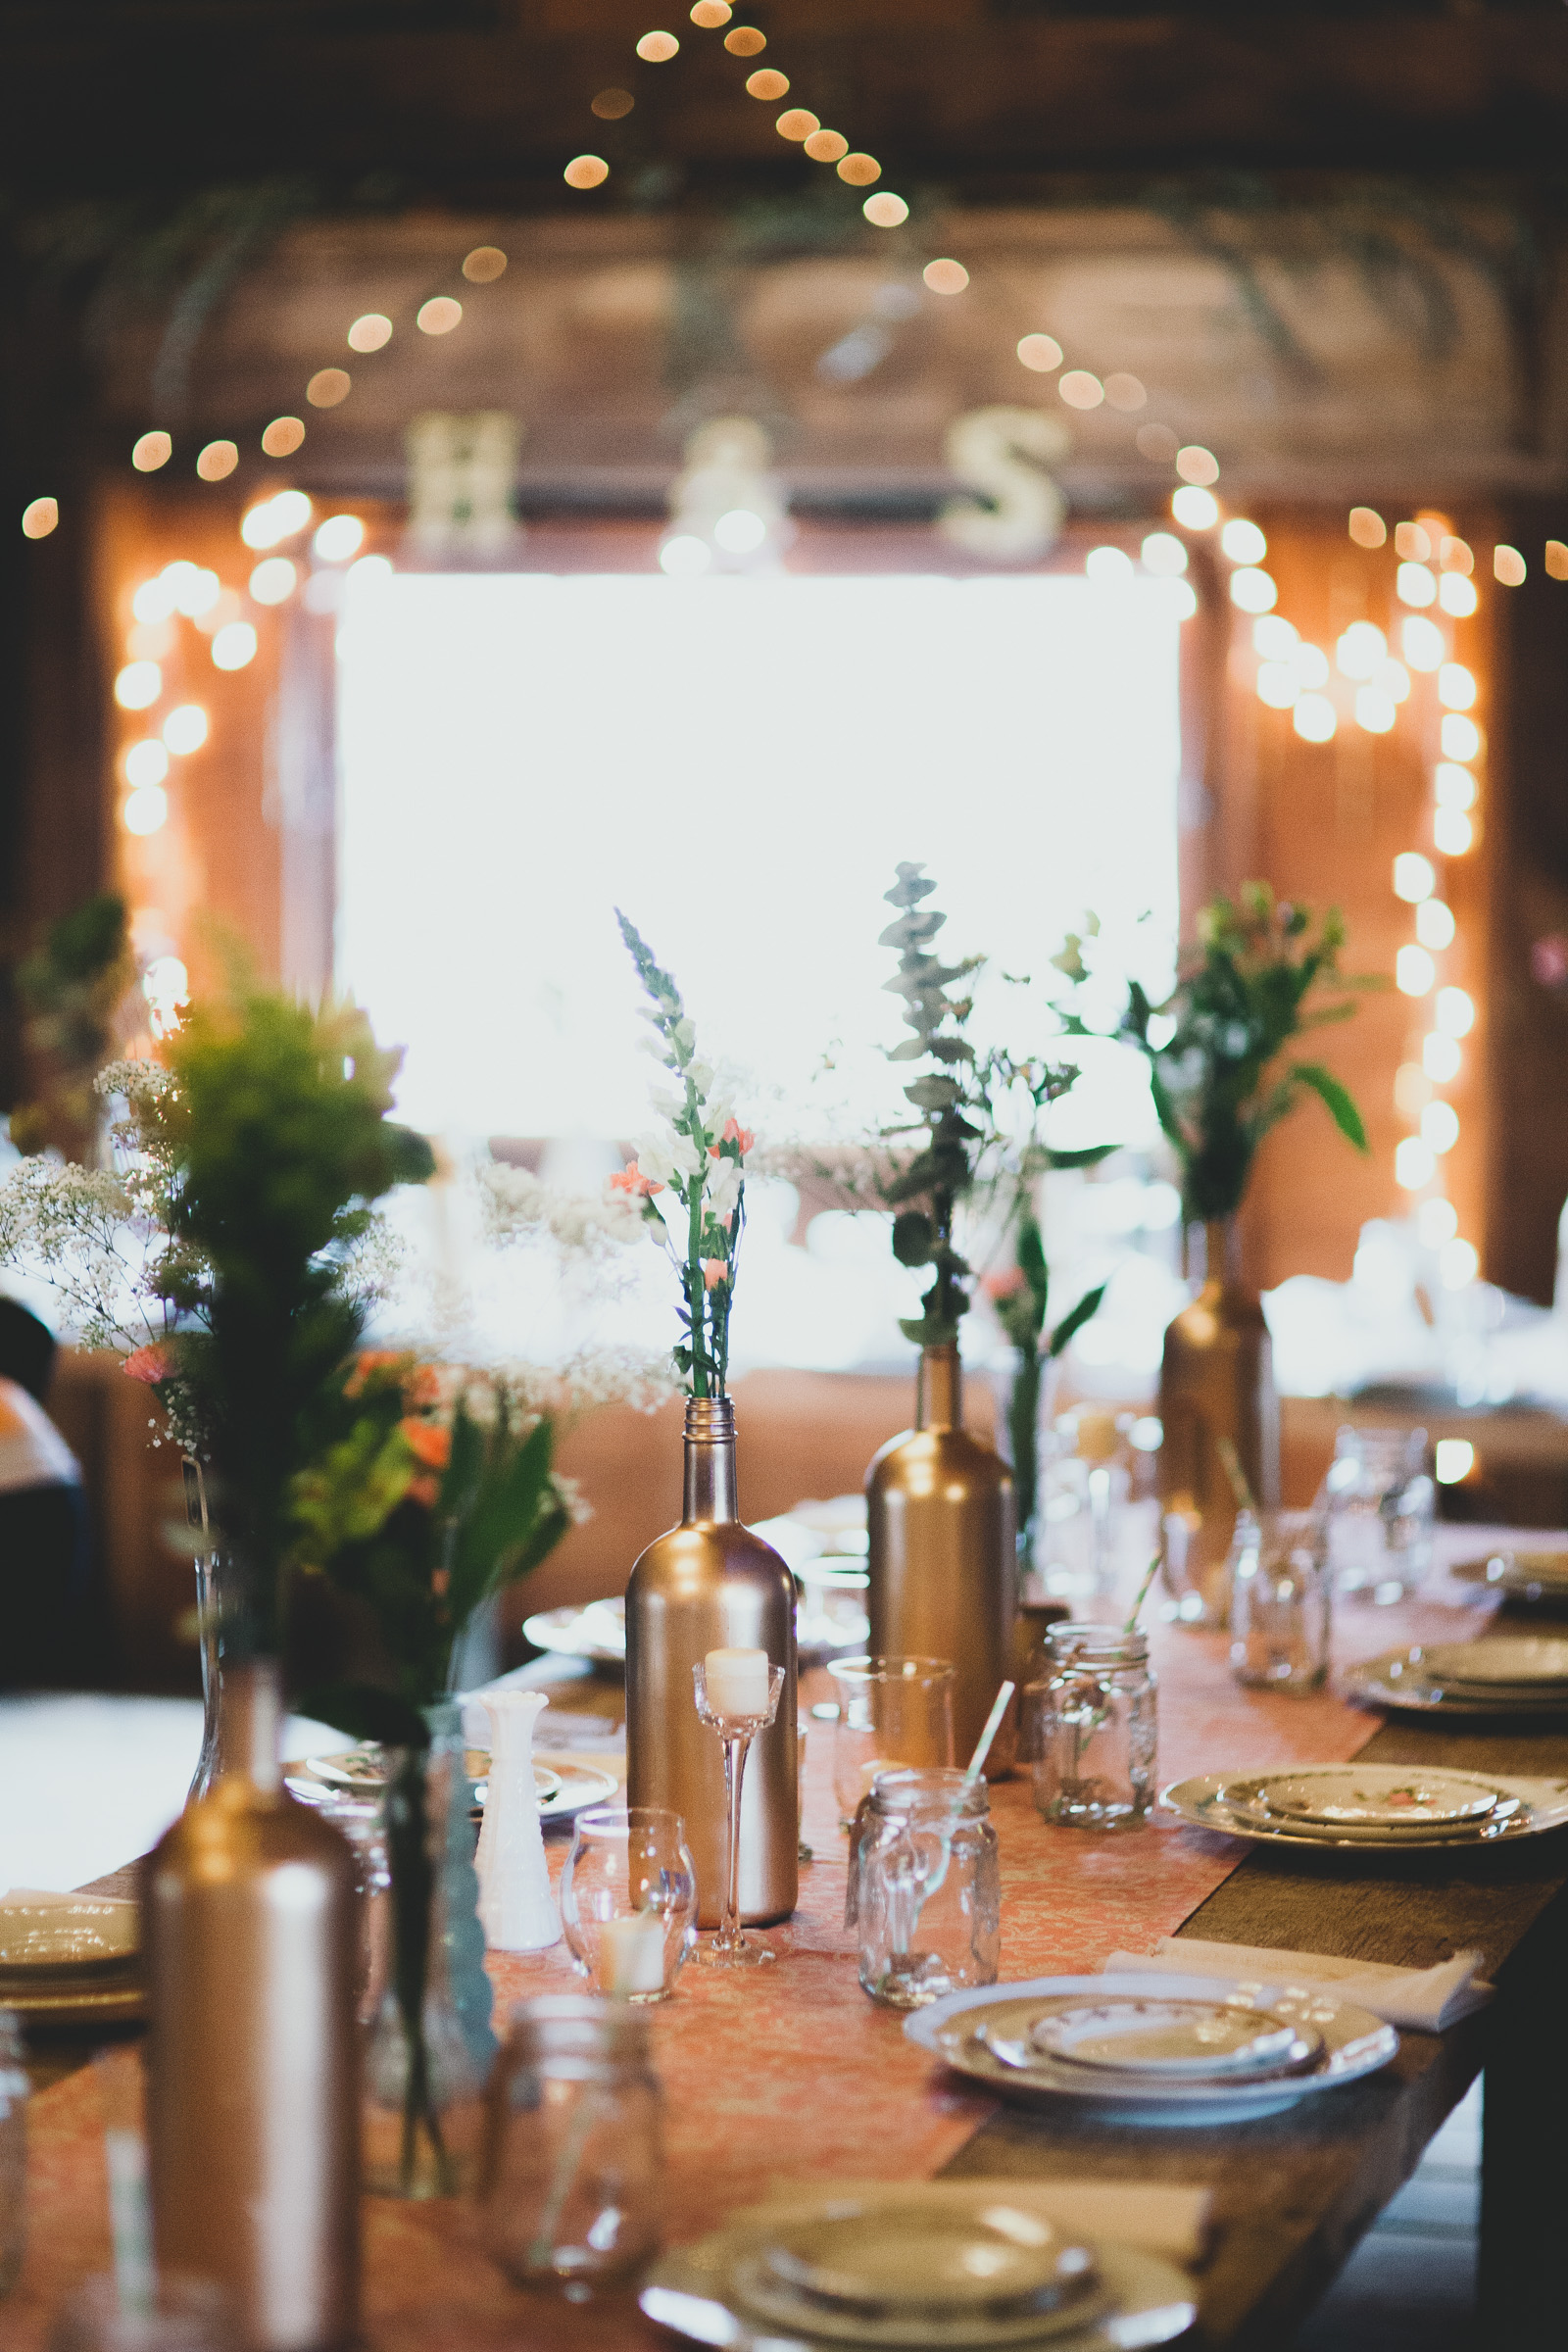 New Jersey Rustic Barn Wedding - Rustic Wedding Chic